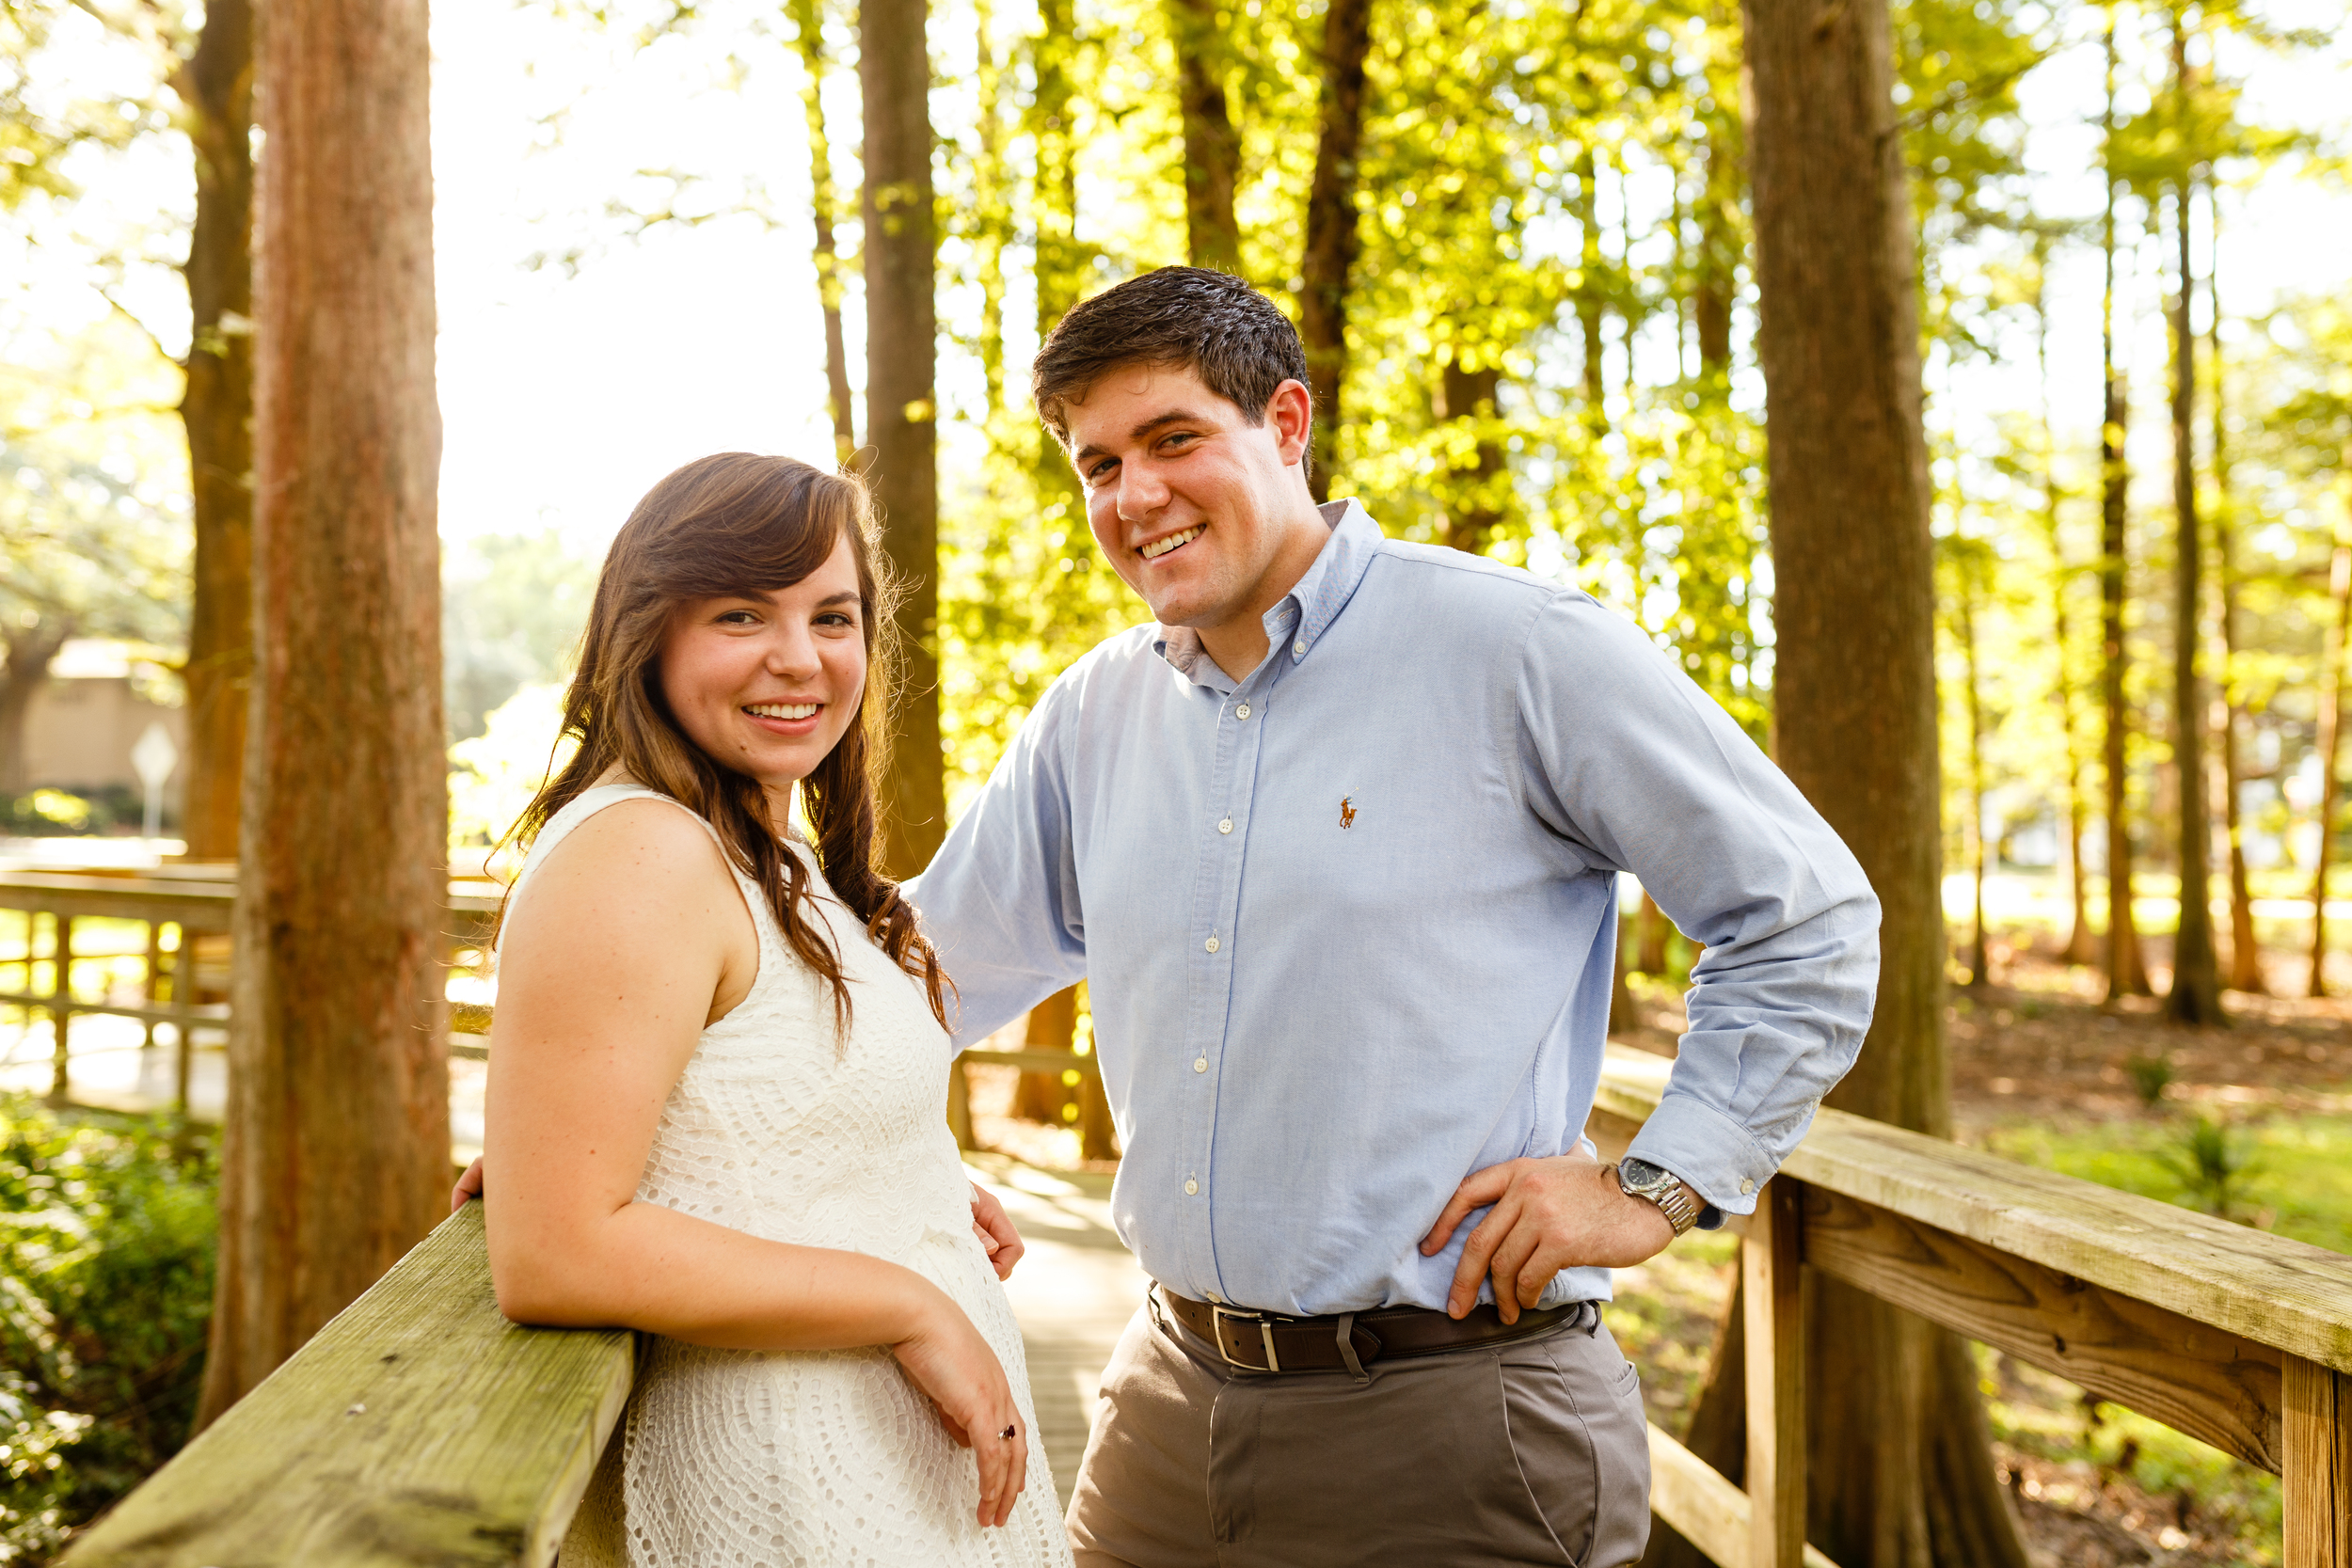 Engagement-portrait-lafayette-broussard-youngsville-photographer-8.jpg